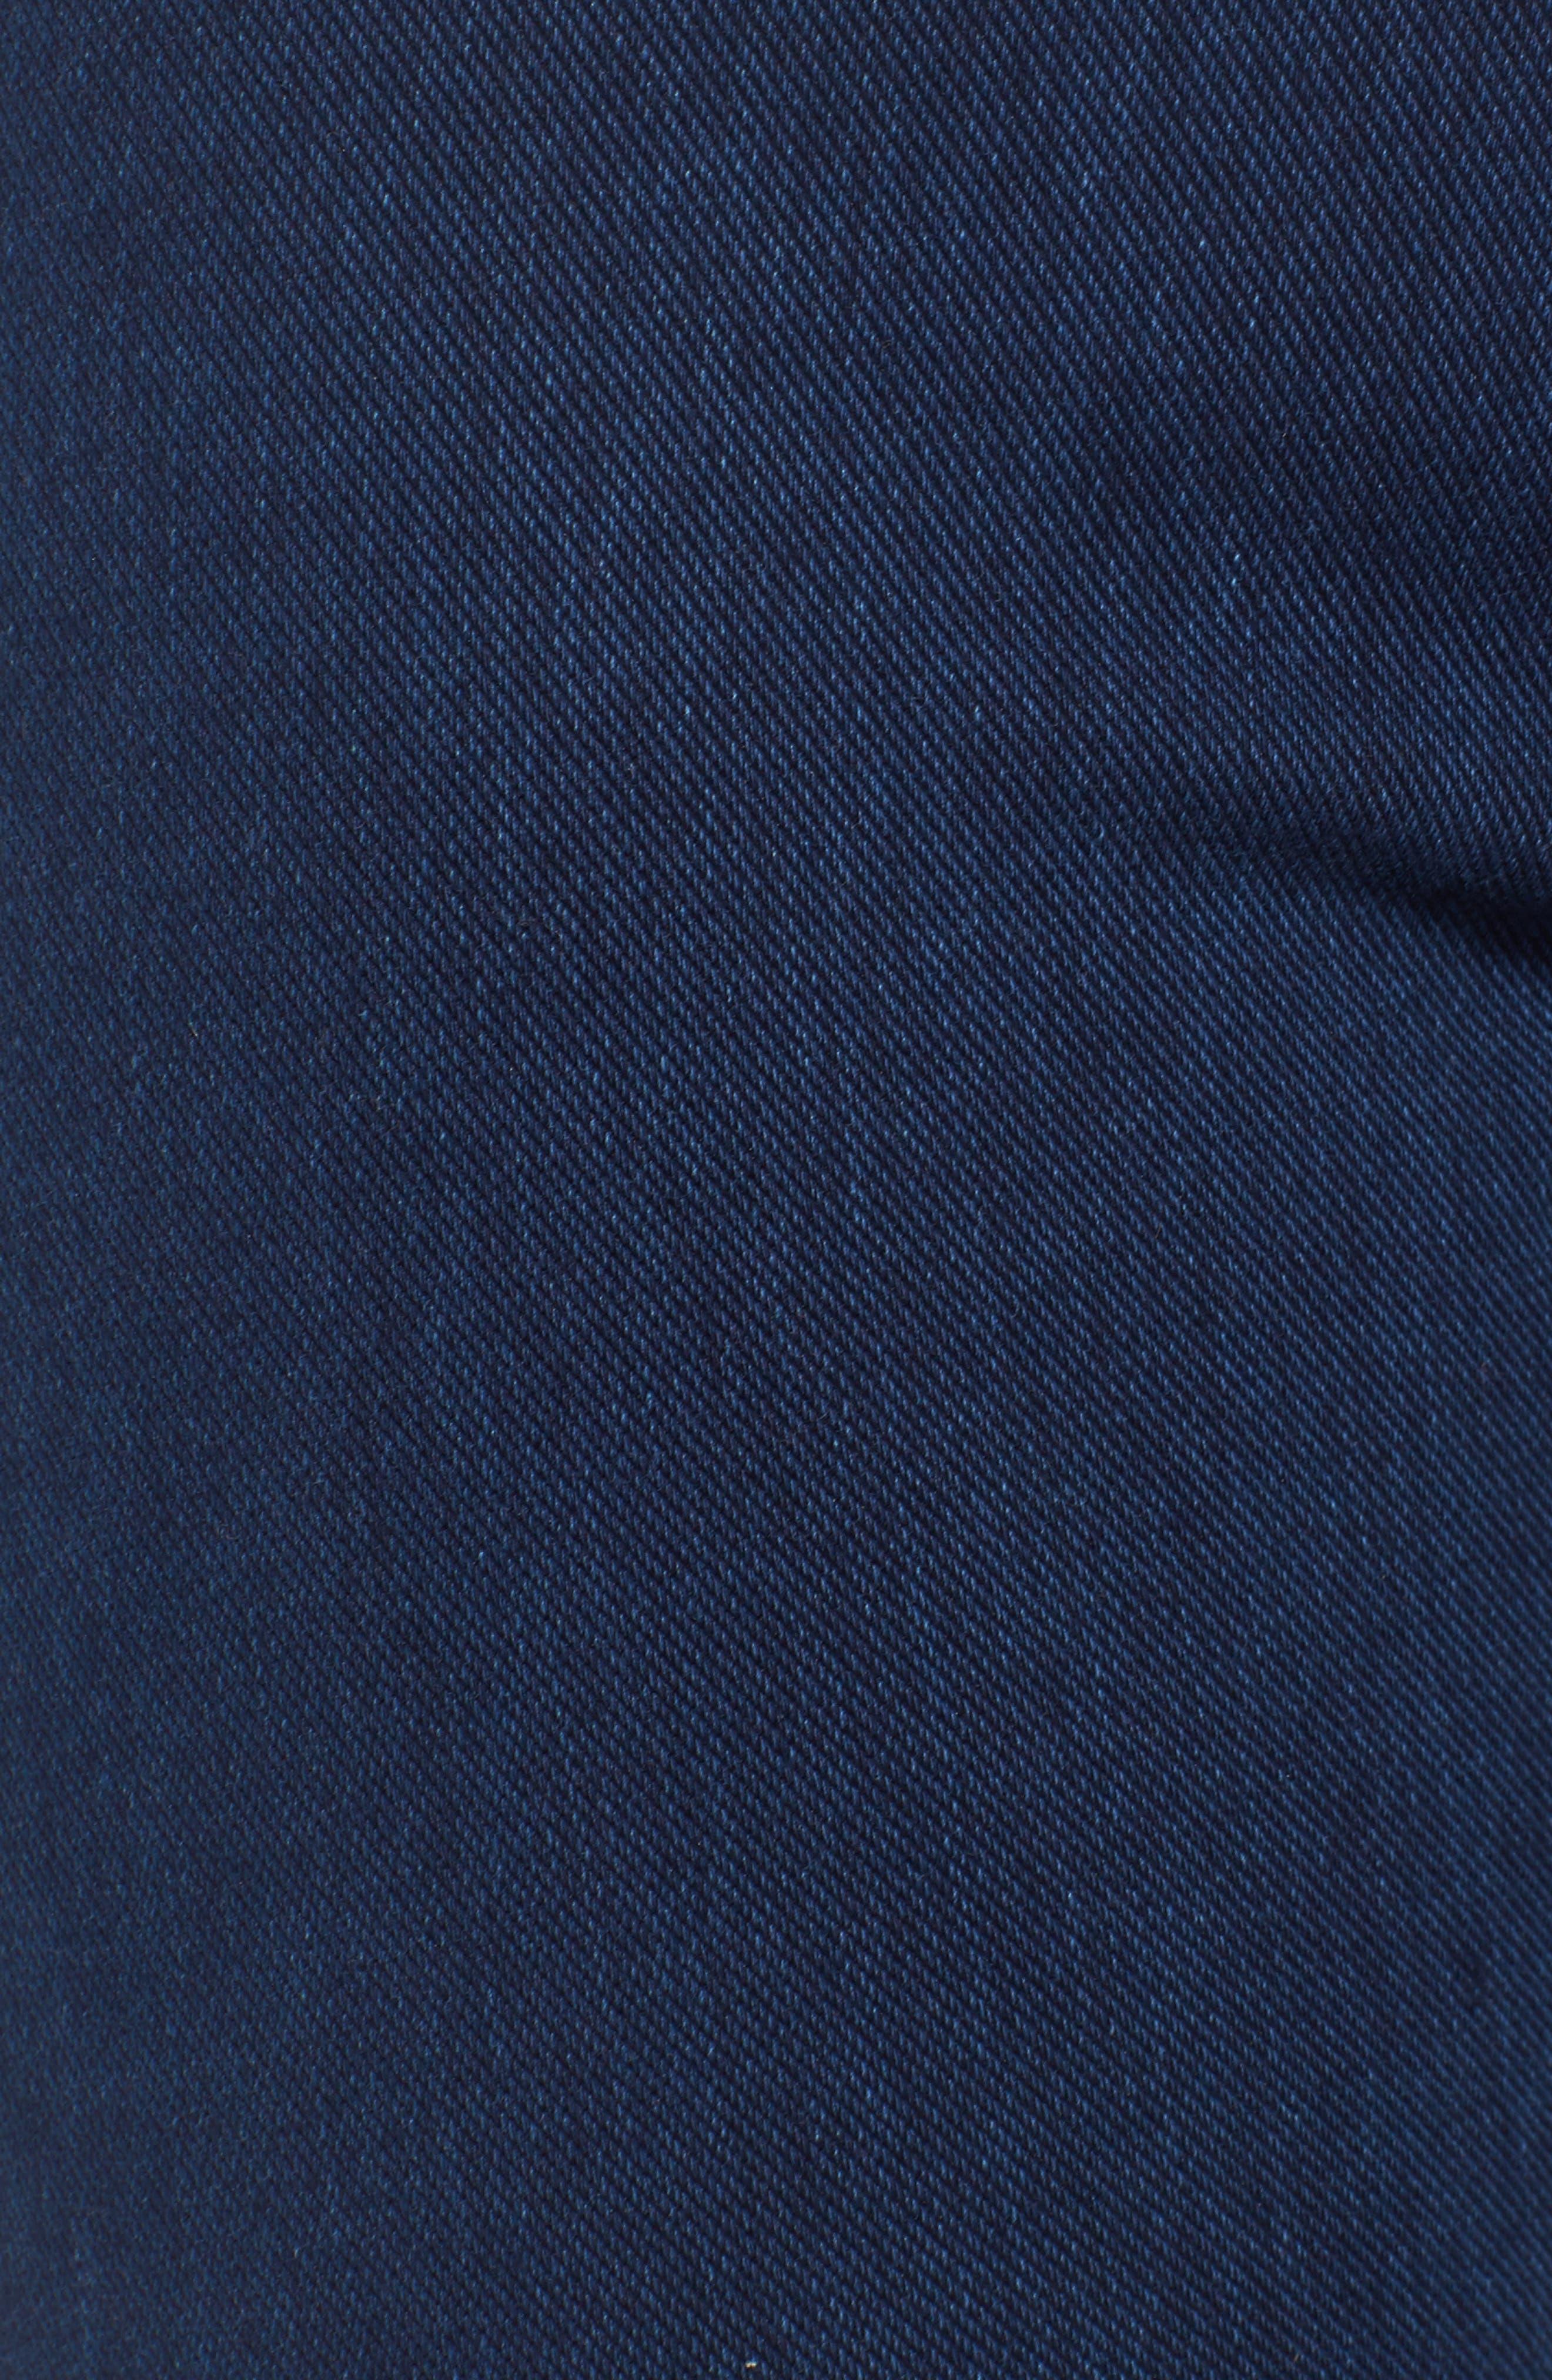 Joie Embellished High Waist Skinny Jeans,                             Alternate thumbnail 5, color,                             401